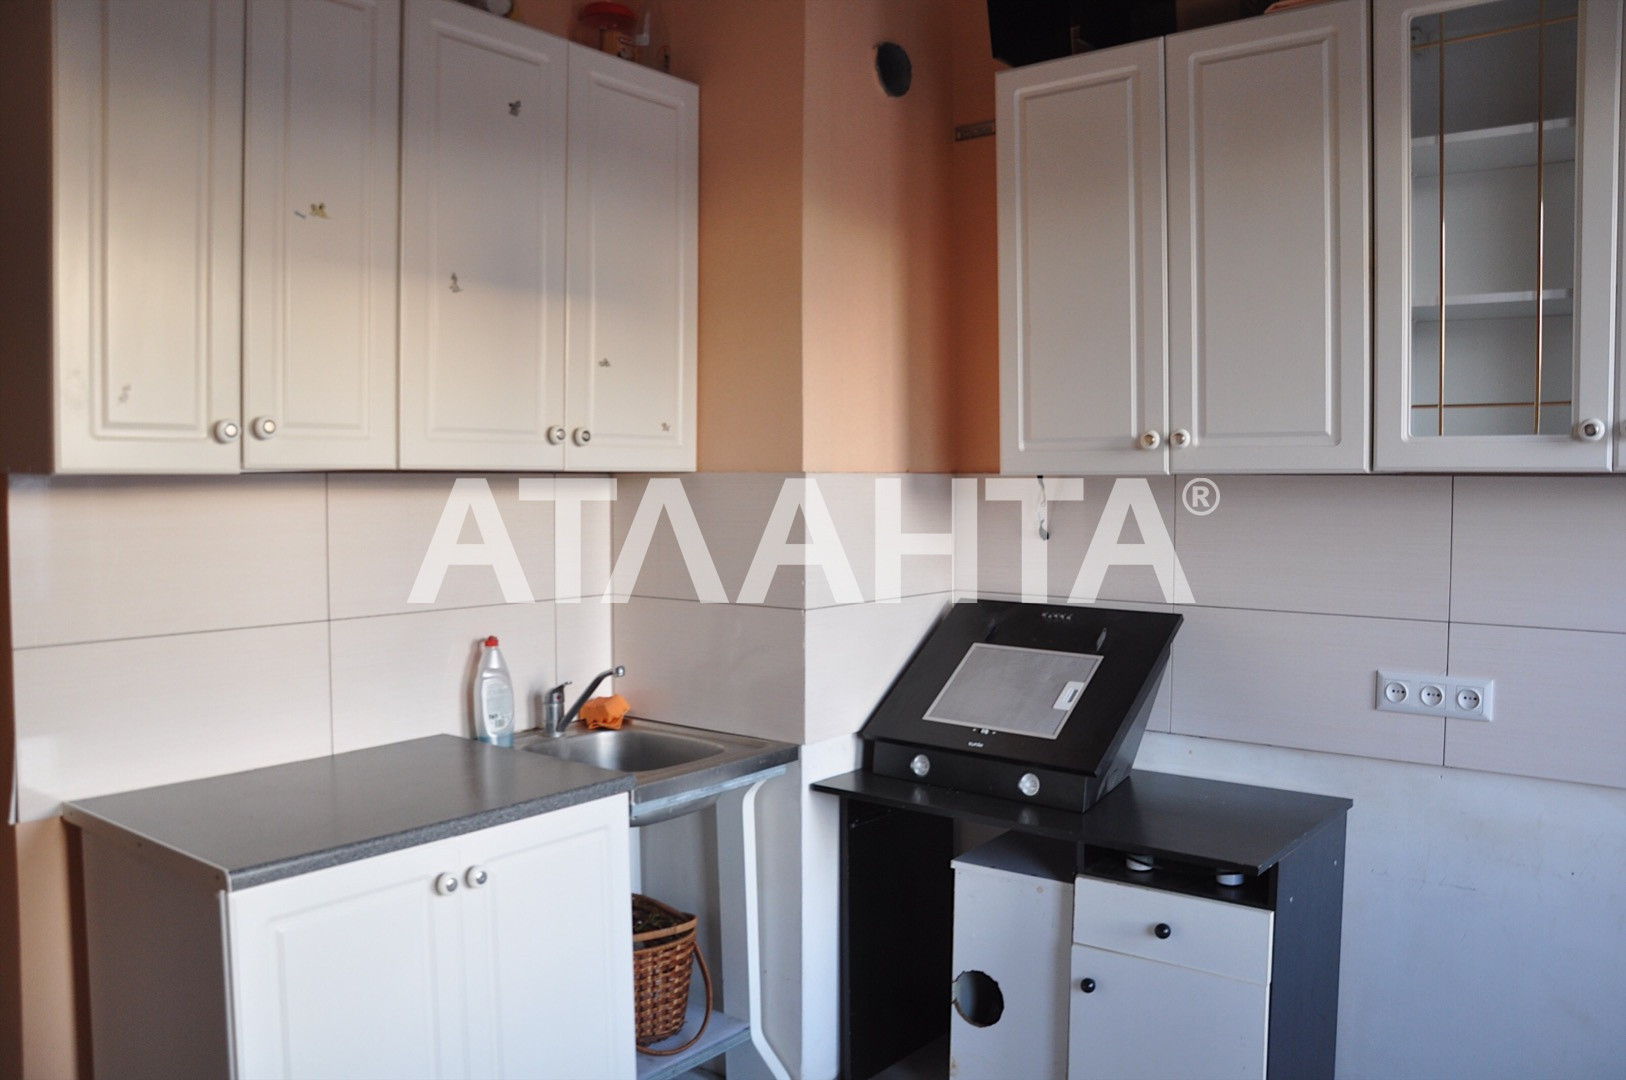 Продается 1-комнатная Квартира на ул. Радужный М-Н — 28 500 у.е. (фото №5)